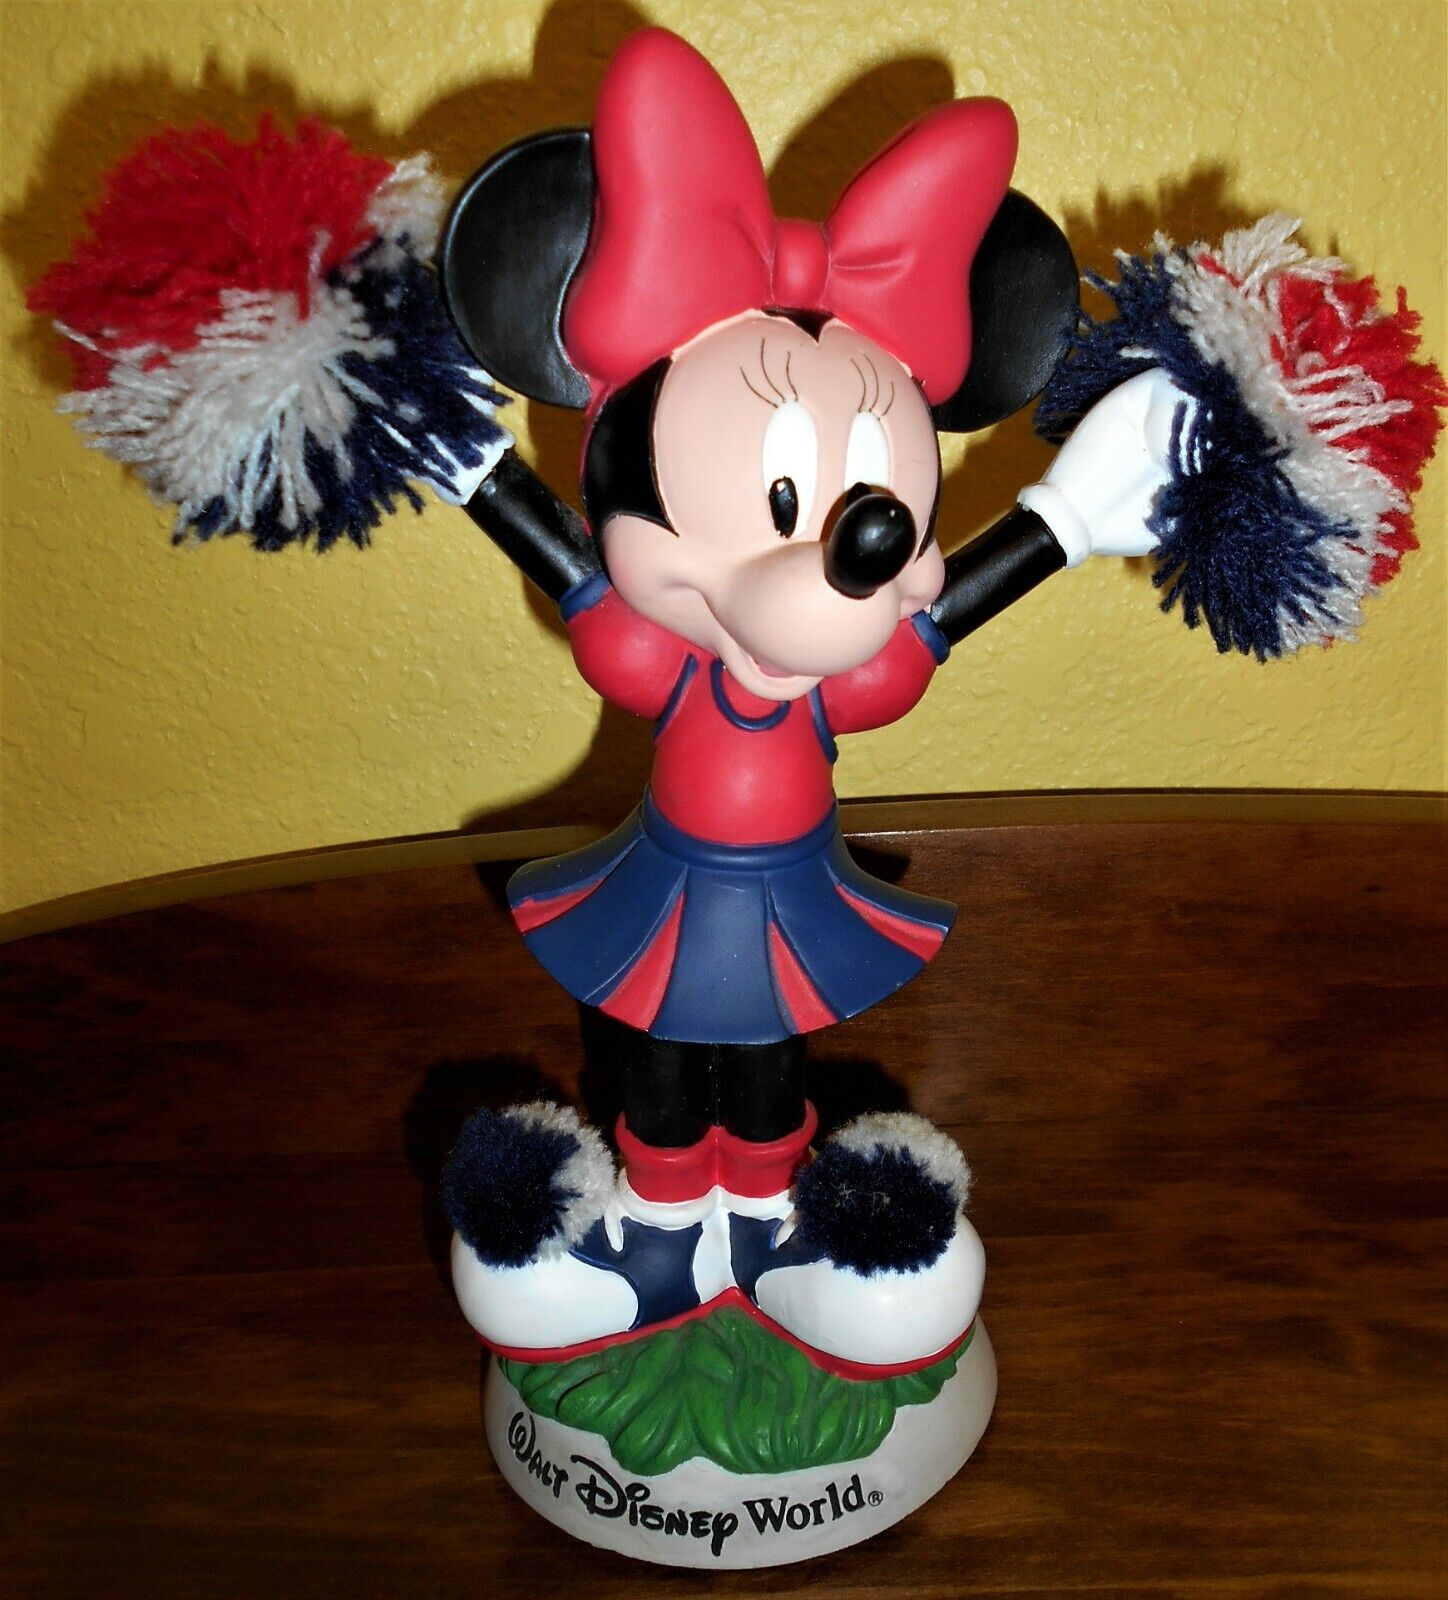 Walt Disney World Minnie Mouse Bobble Cheerleader With Pom Poms 9 Tall - $12.00